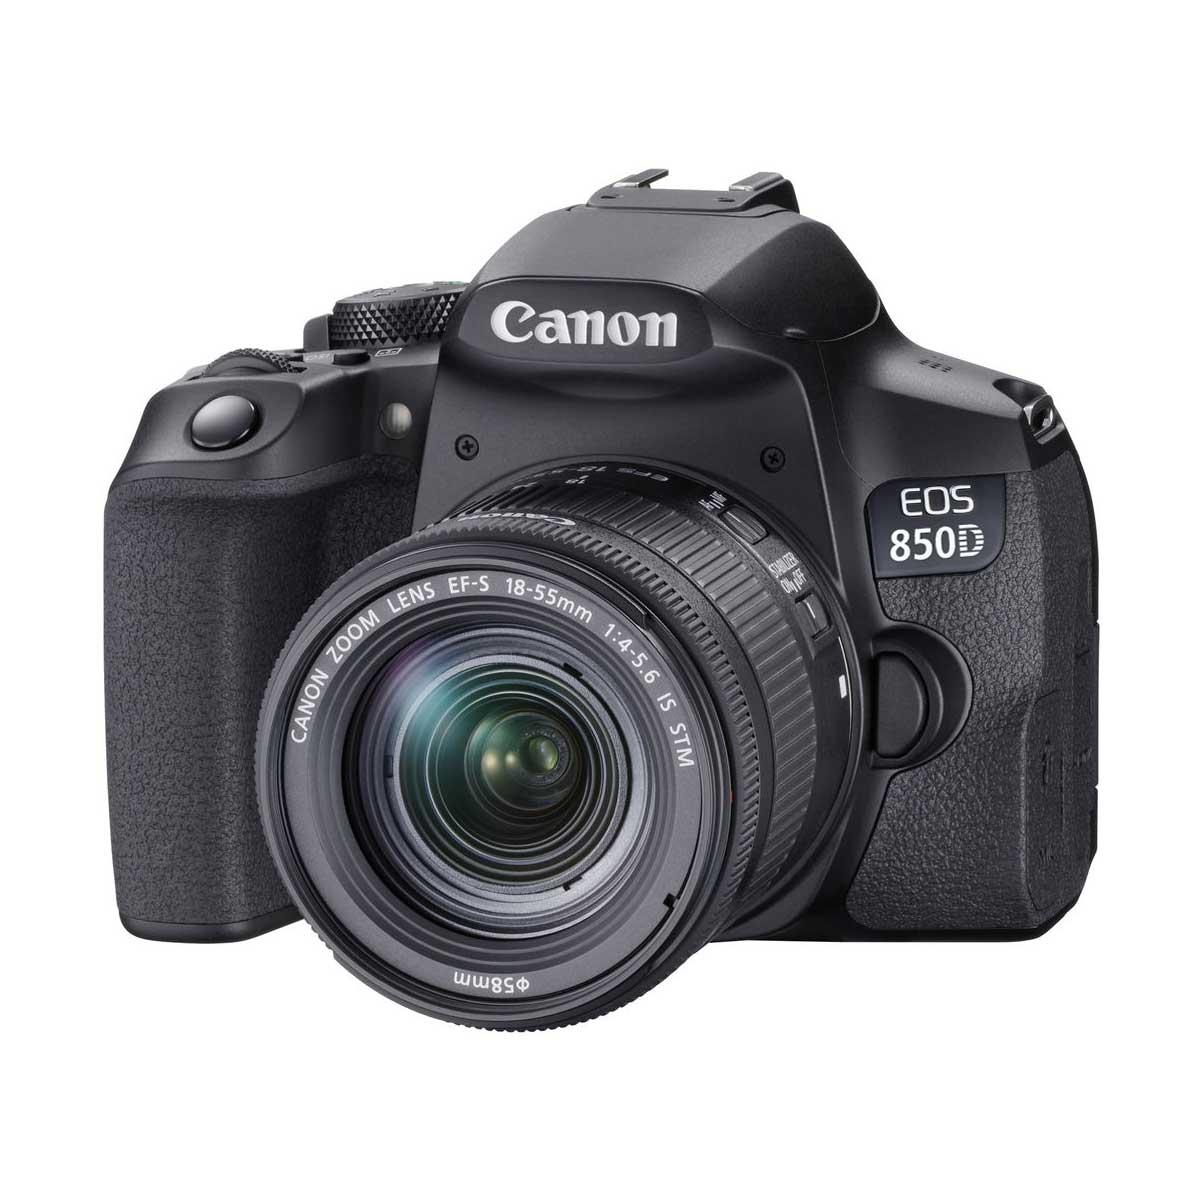 دوربین دیجیتال کانن مدل EOS 850D به همراه لنز 55-18 میلی متر IS STM